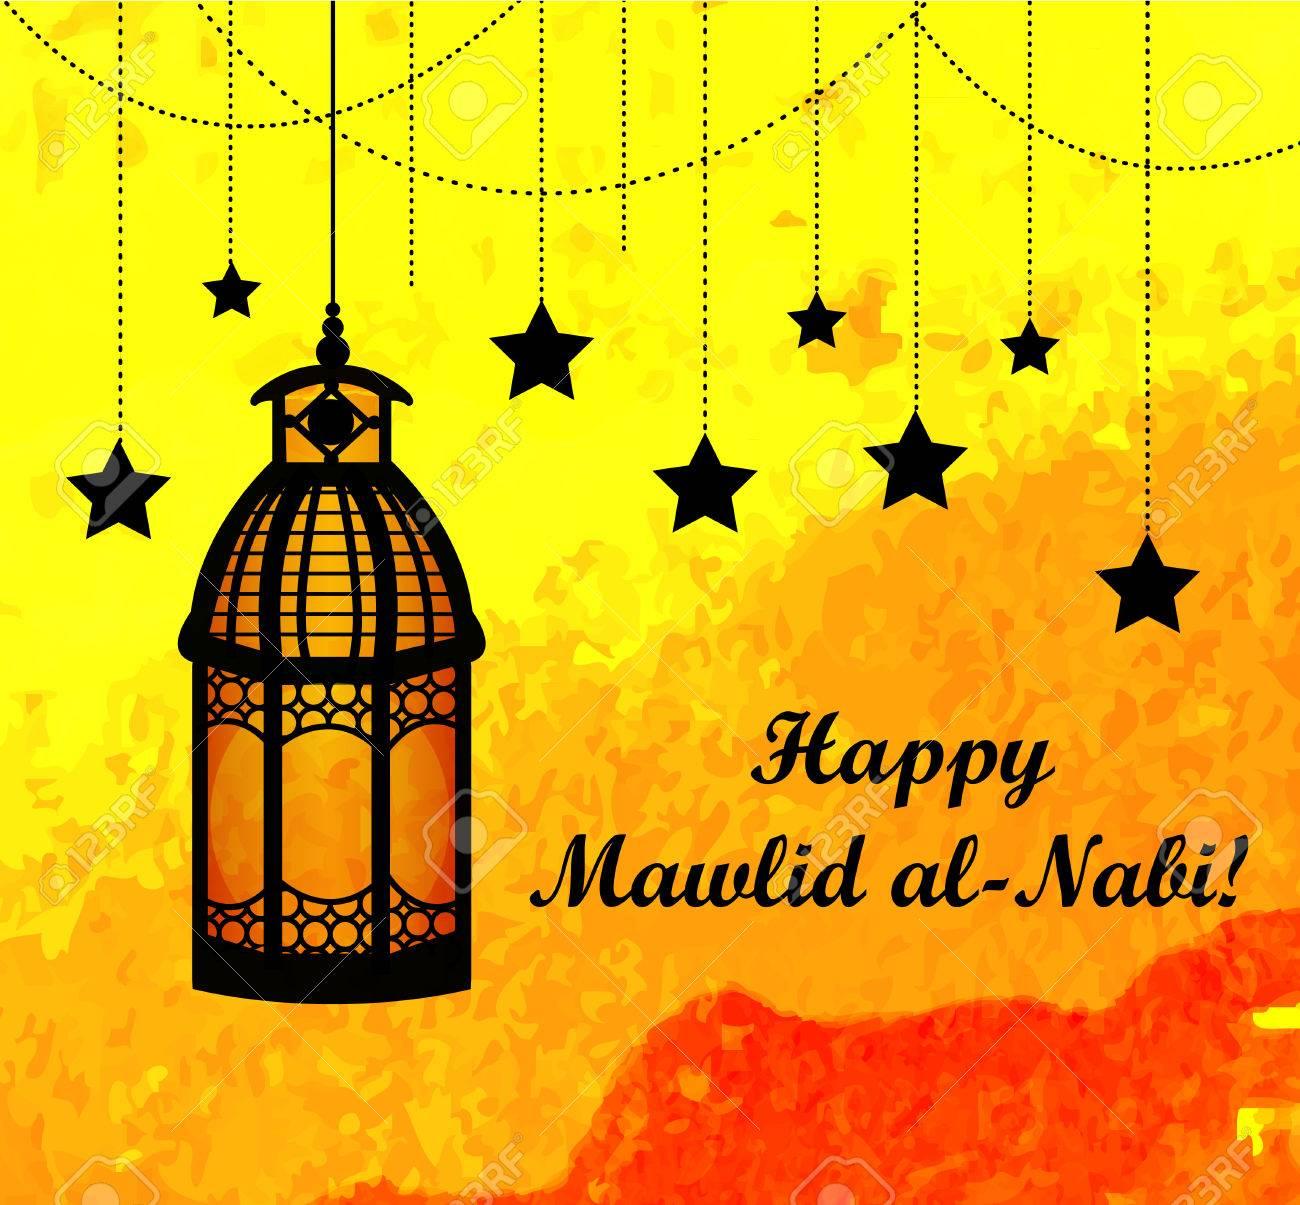 Mawlid al nabi the birthday of the prophet muhammad greeting mawlid al nabi the birthday of the prophet muhammad greeting card muslim celebration poster m4hsunfo